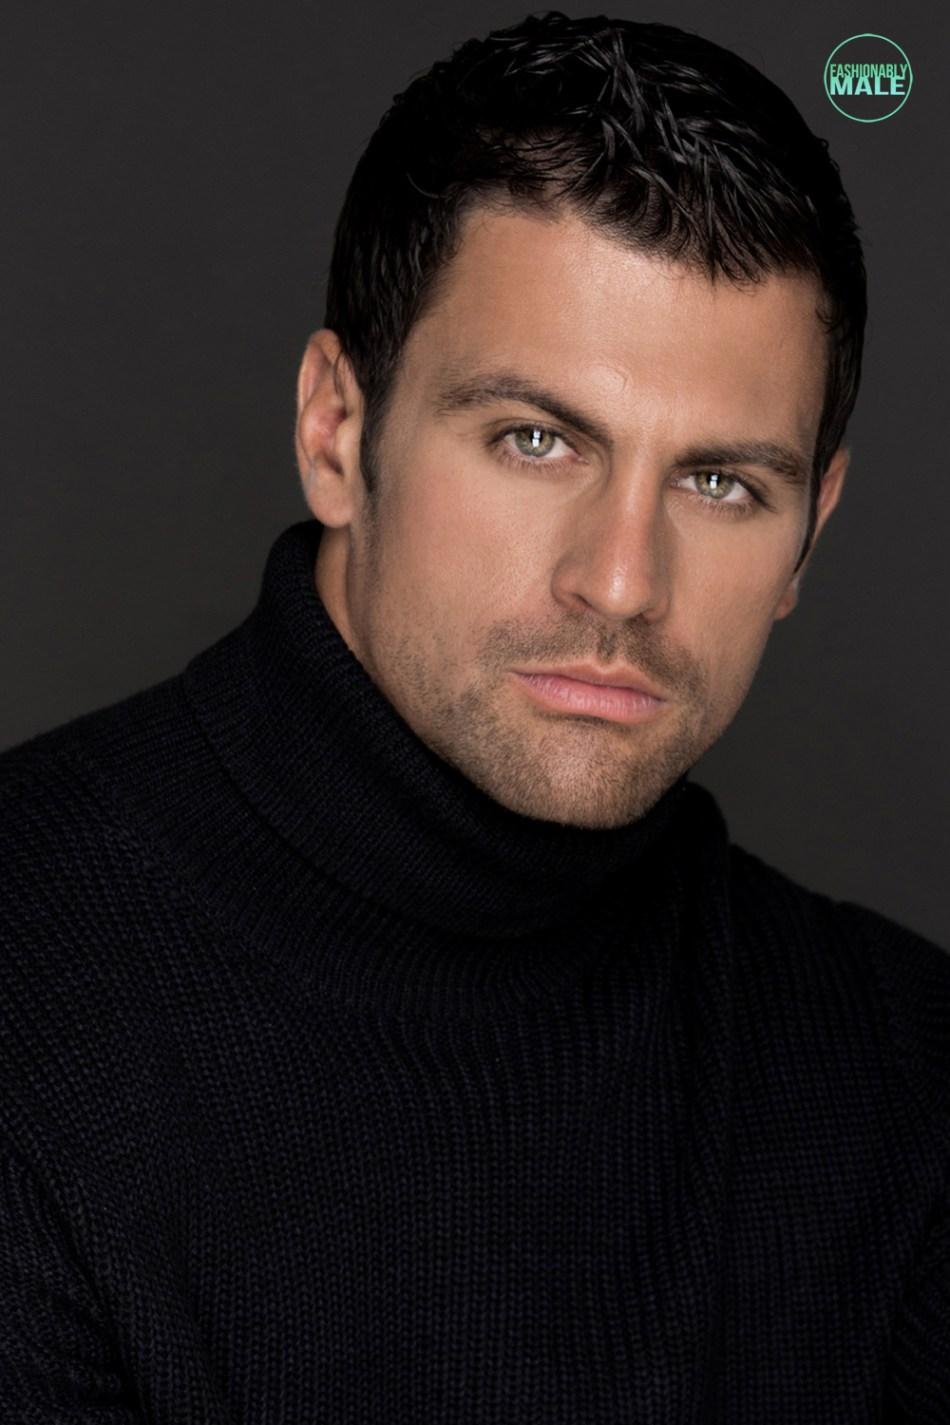 Michael J Scanlon for FashionablyMale (4)